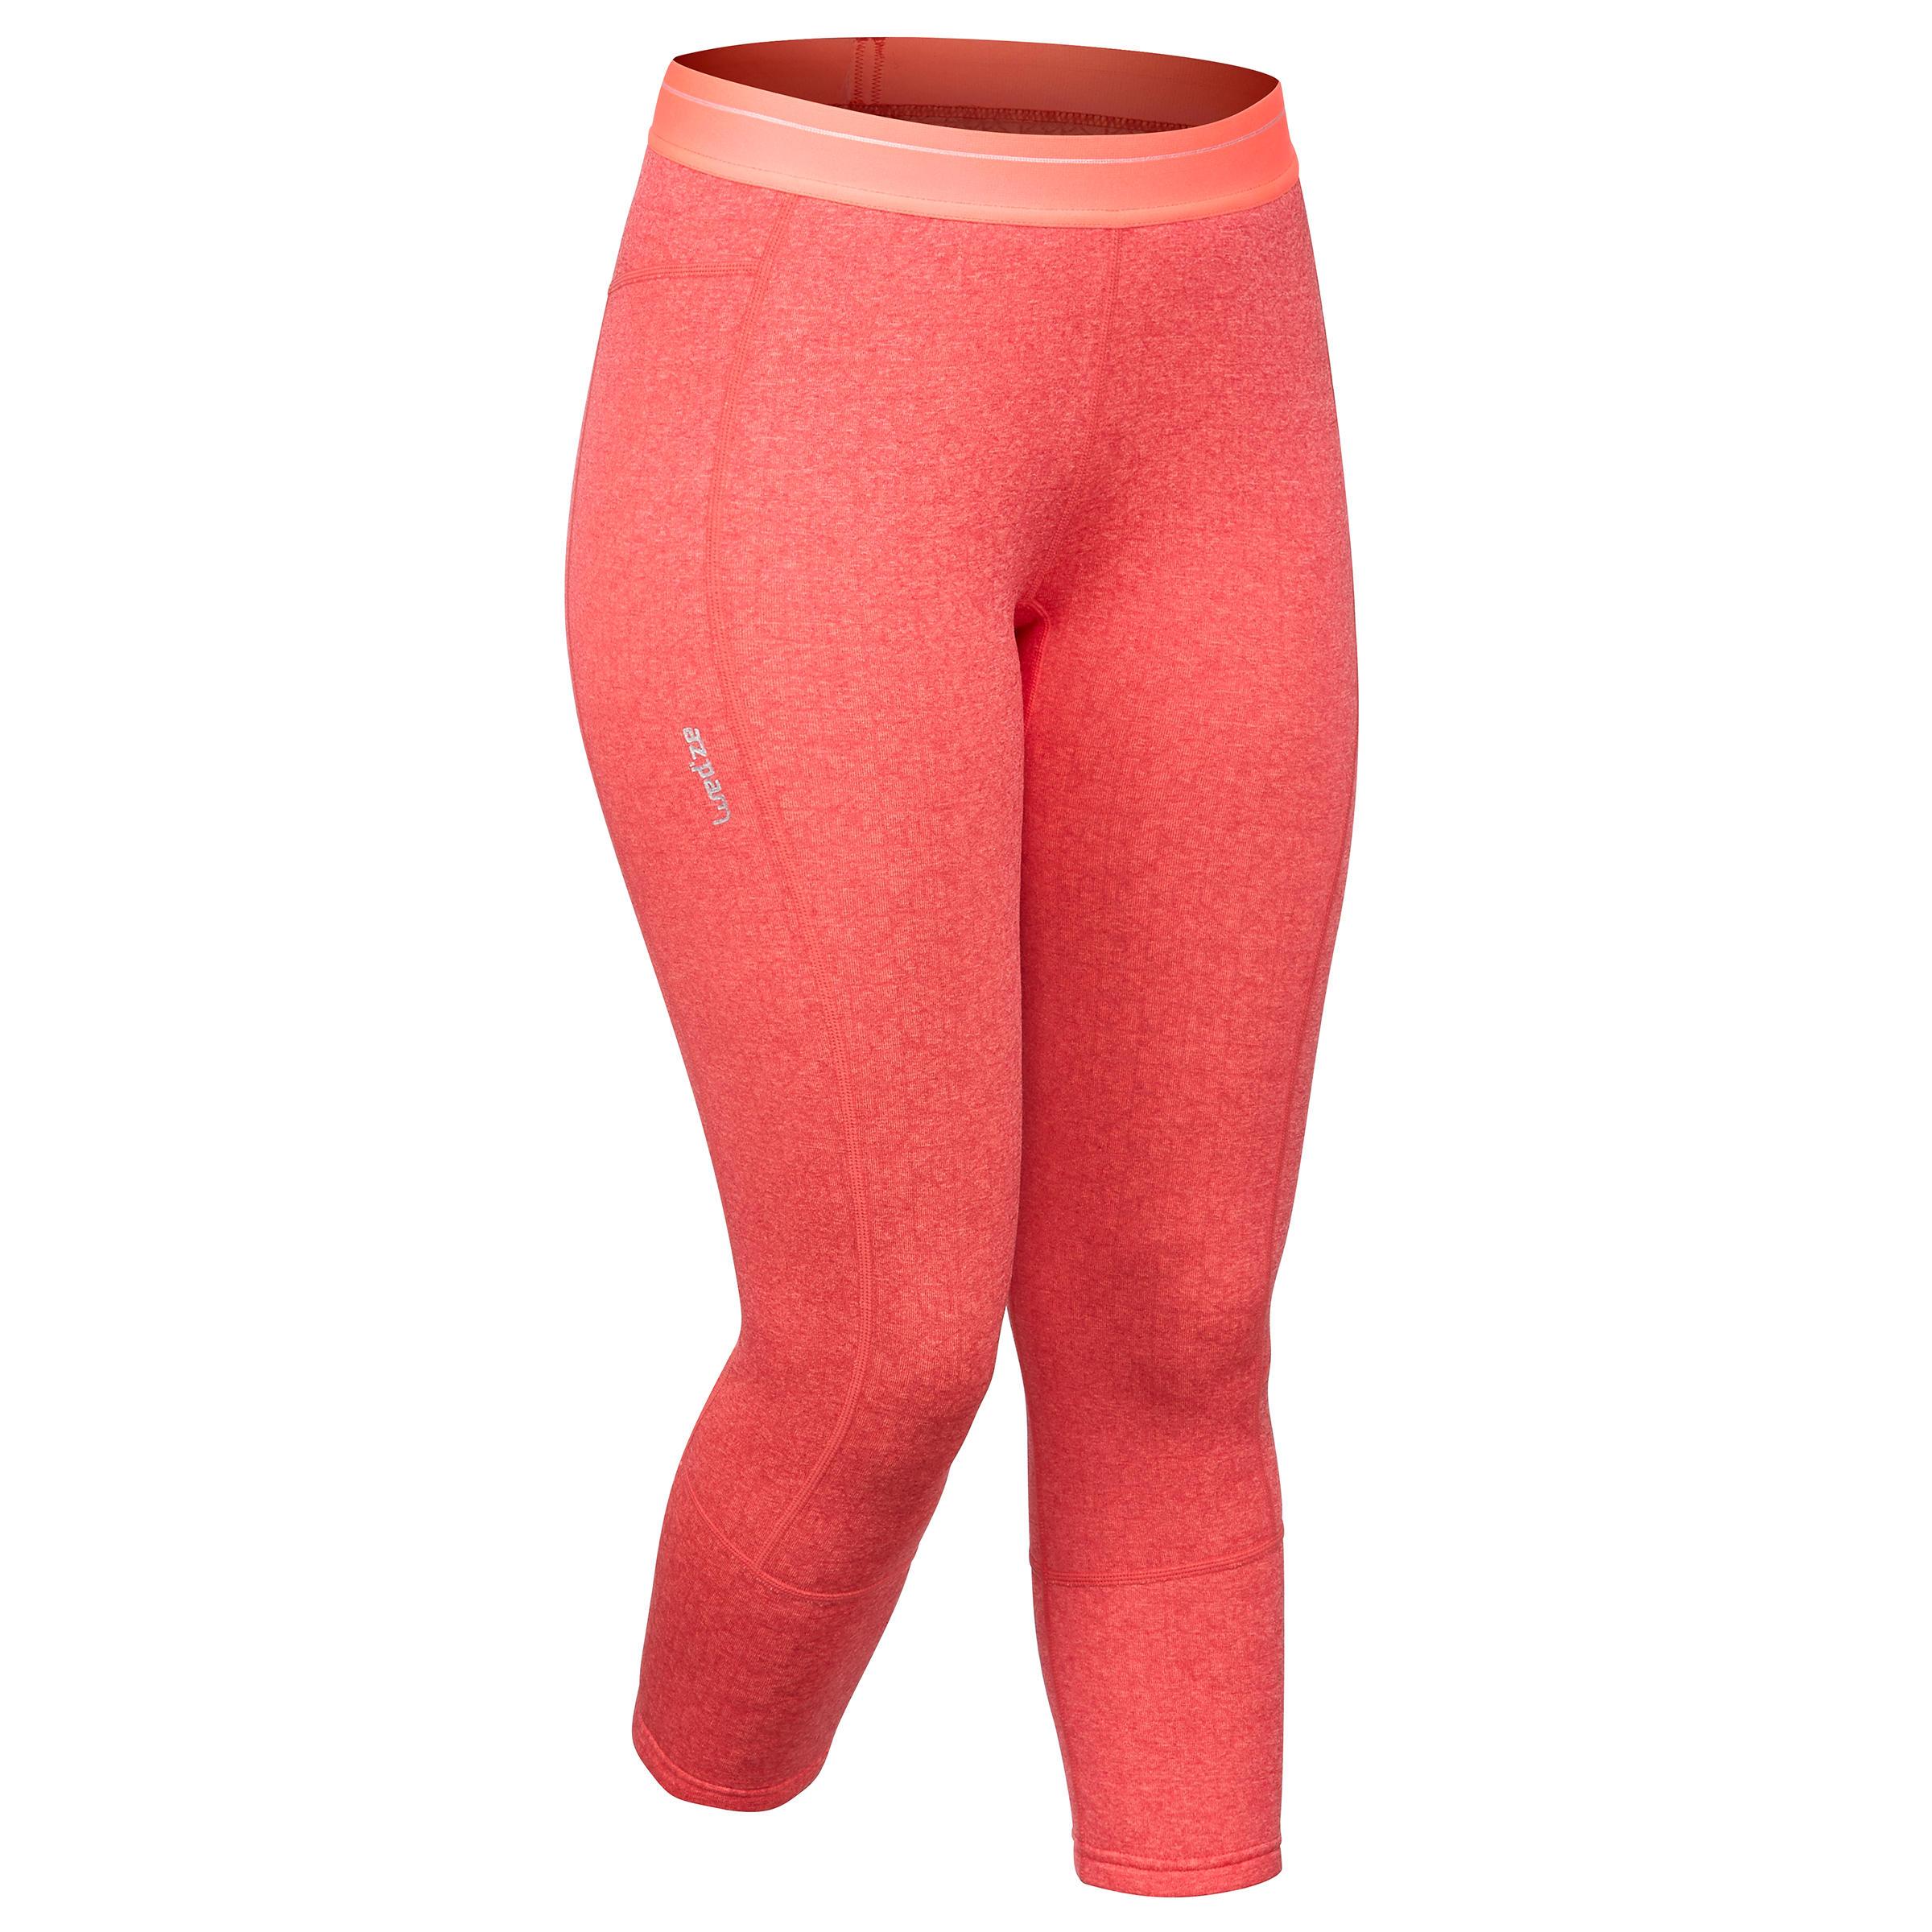 Skiunterhose 500 Damen koralle | Sportbekleidung > Funktionswäsche > Thermounterwäsche | Rot - Rosa | Polyester | Wed´ze